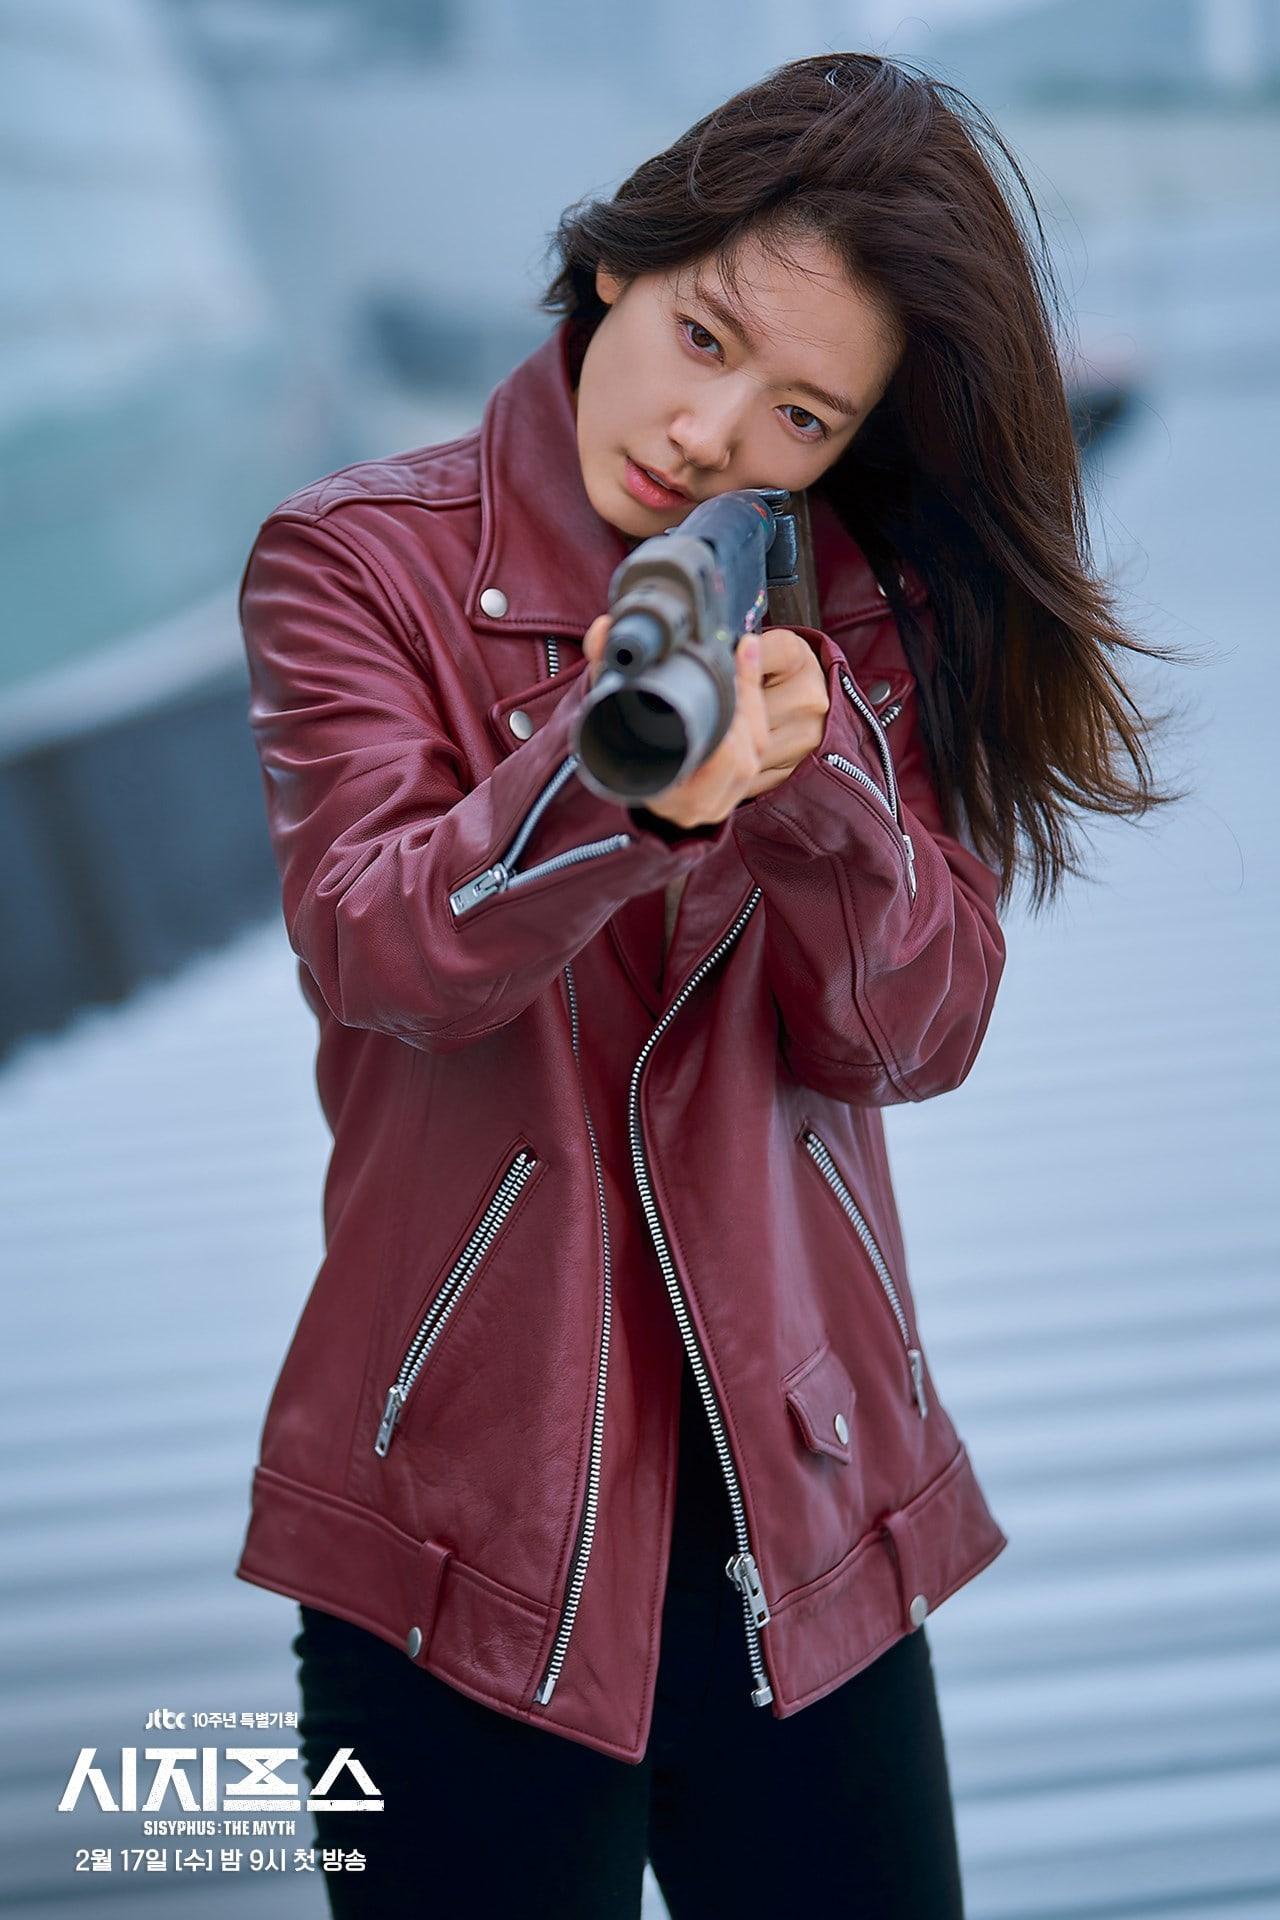 Kang Seo Hae - Sisyphus The Myth